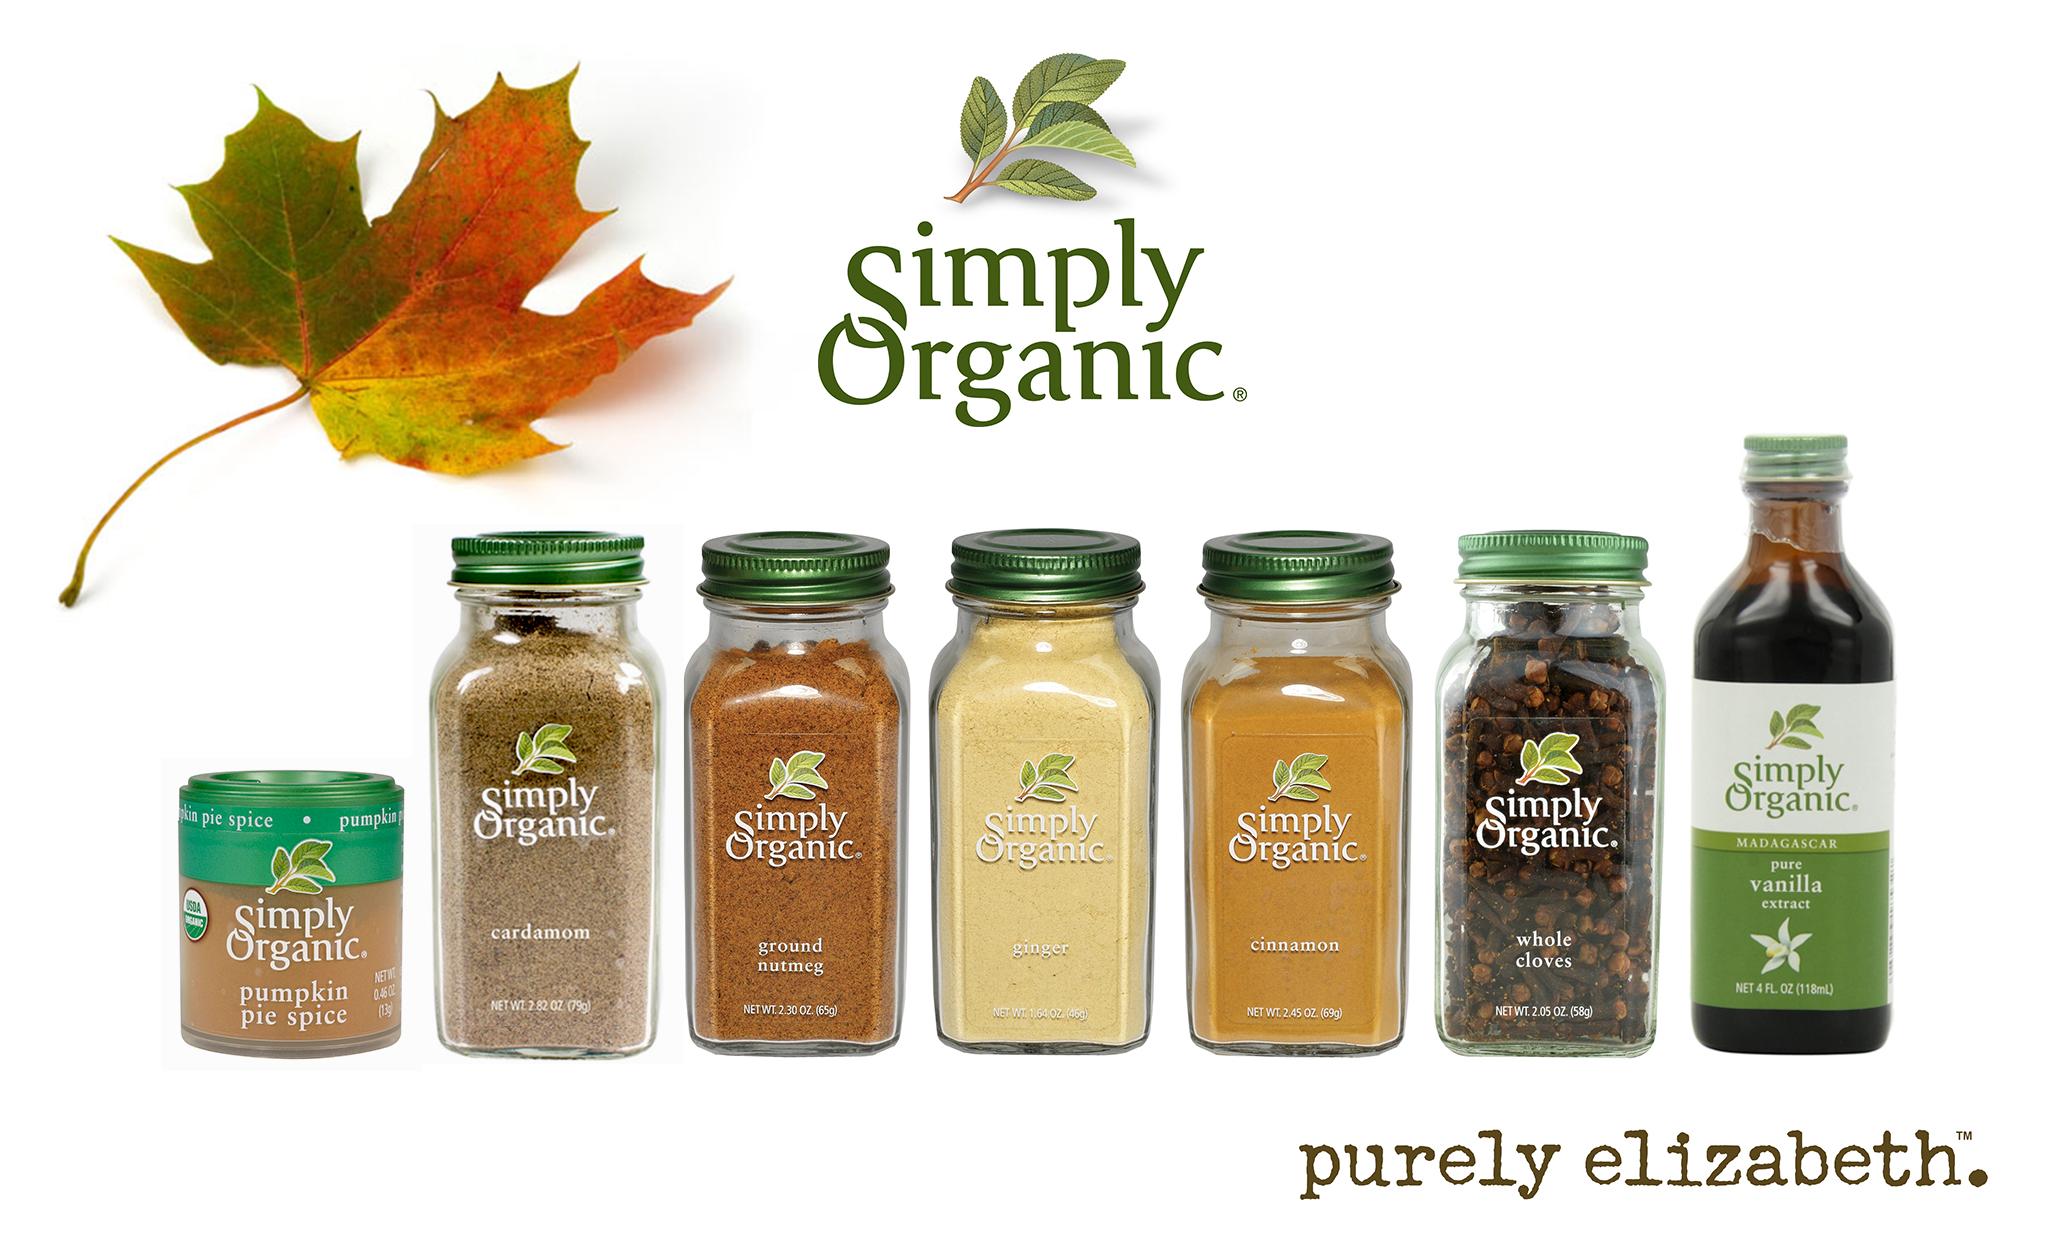 Simply organic herbs